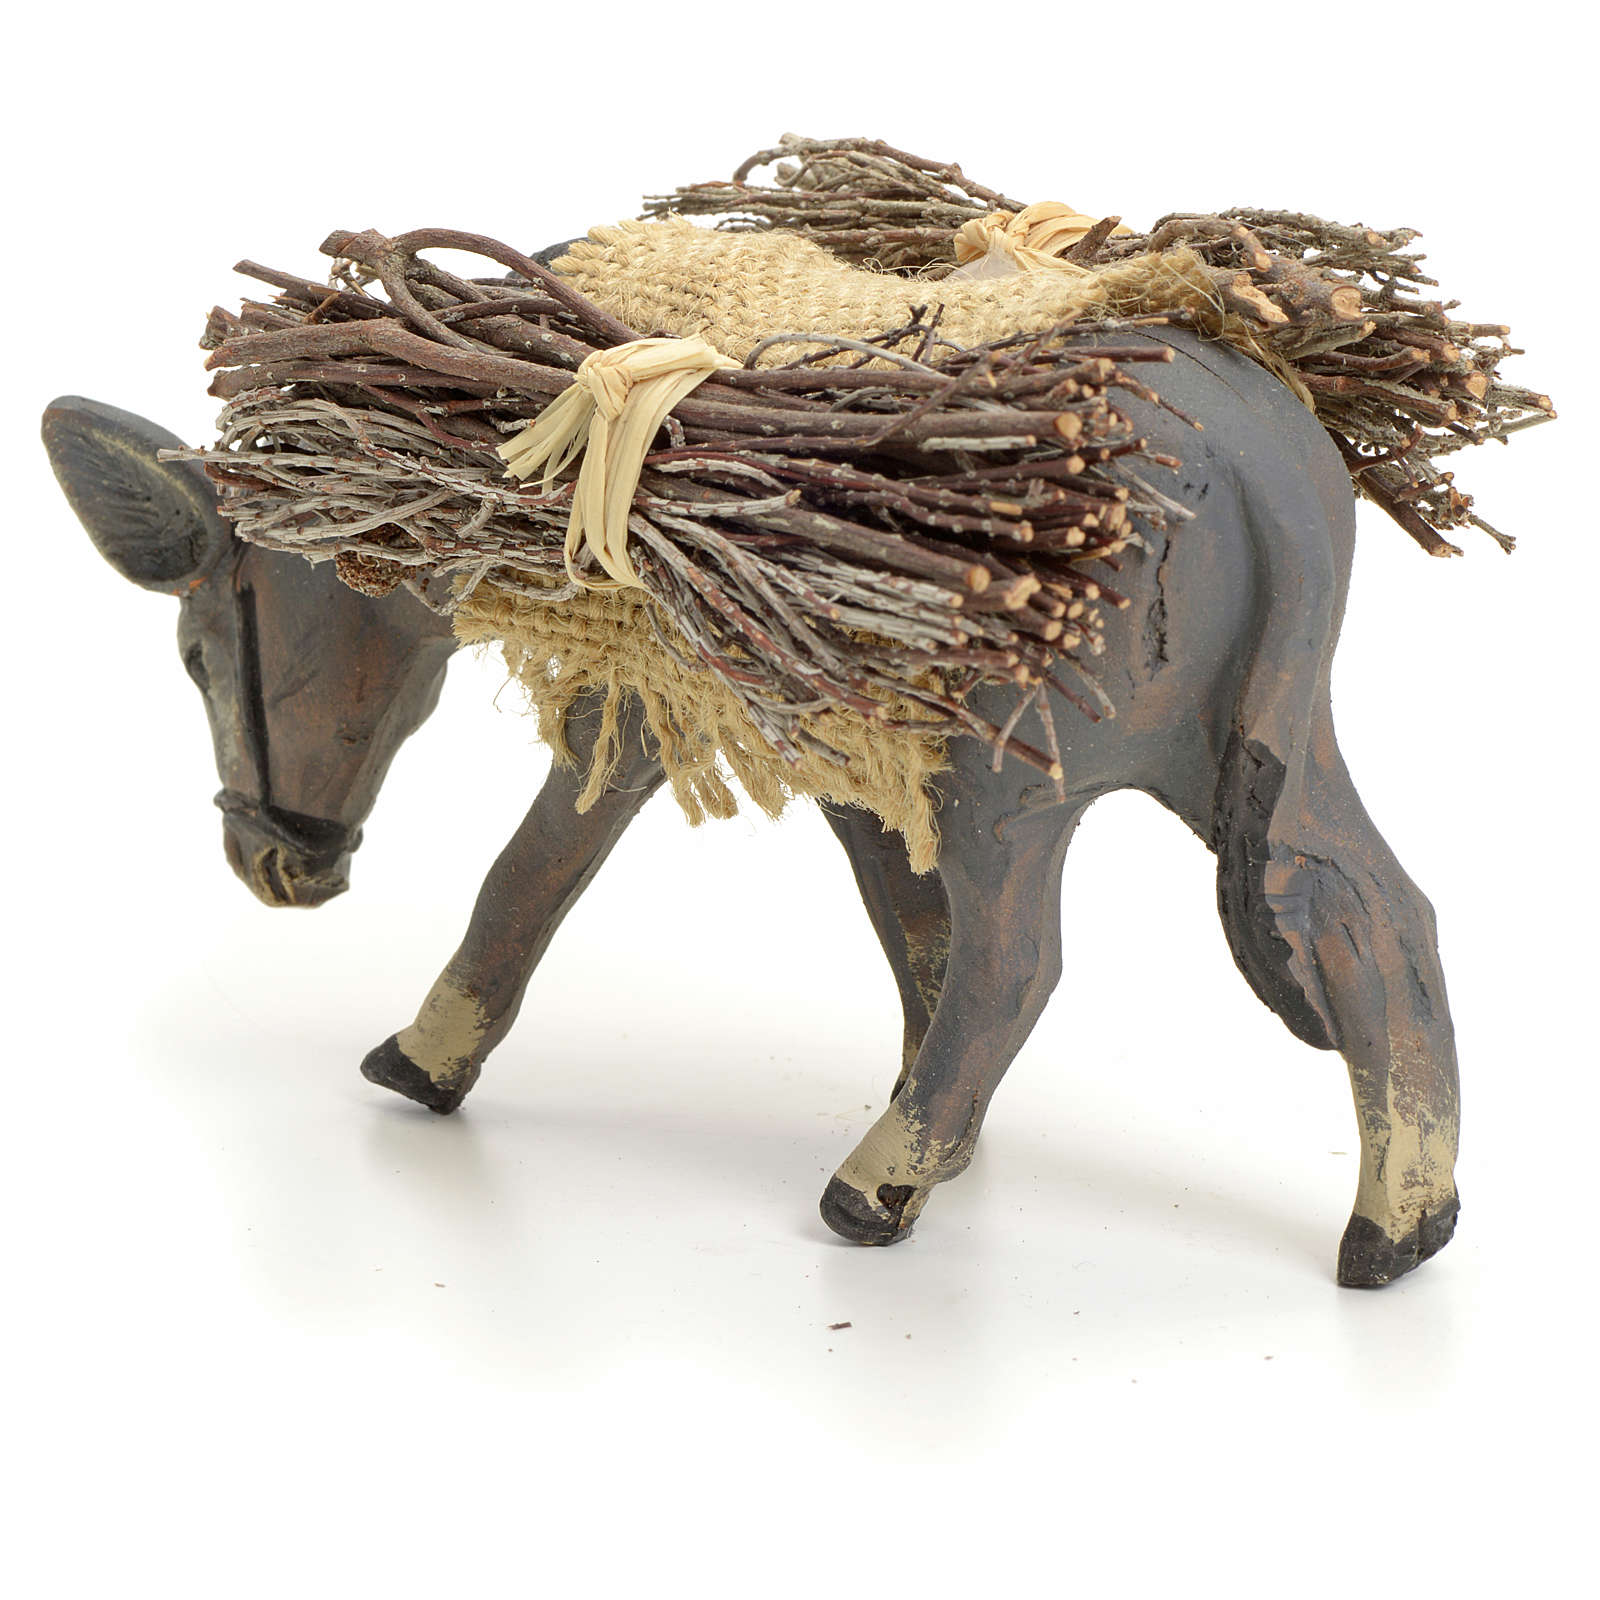 Neapolitan nativity figurine, standing donkey with wood, 8cm 4